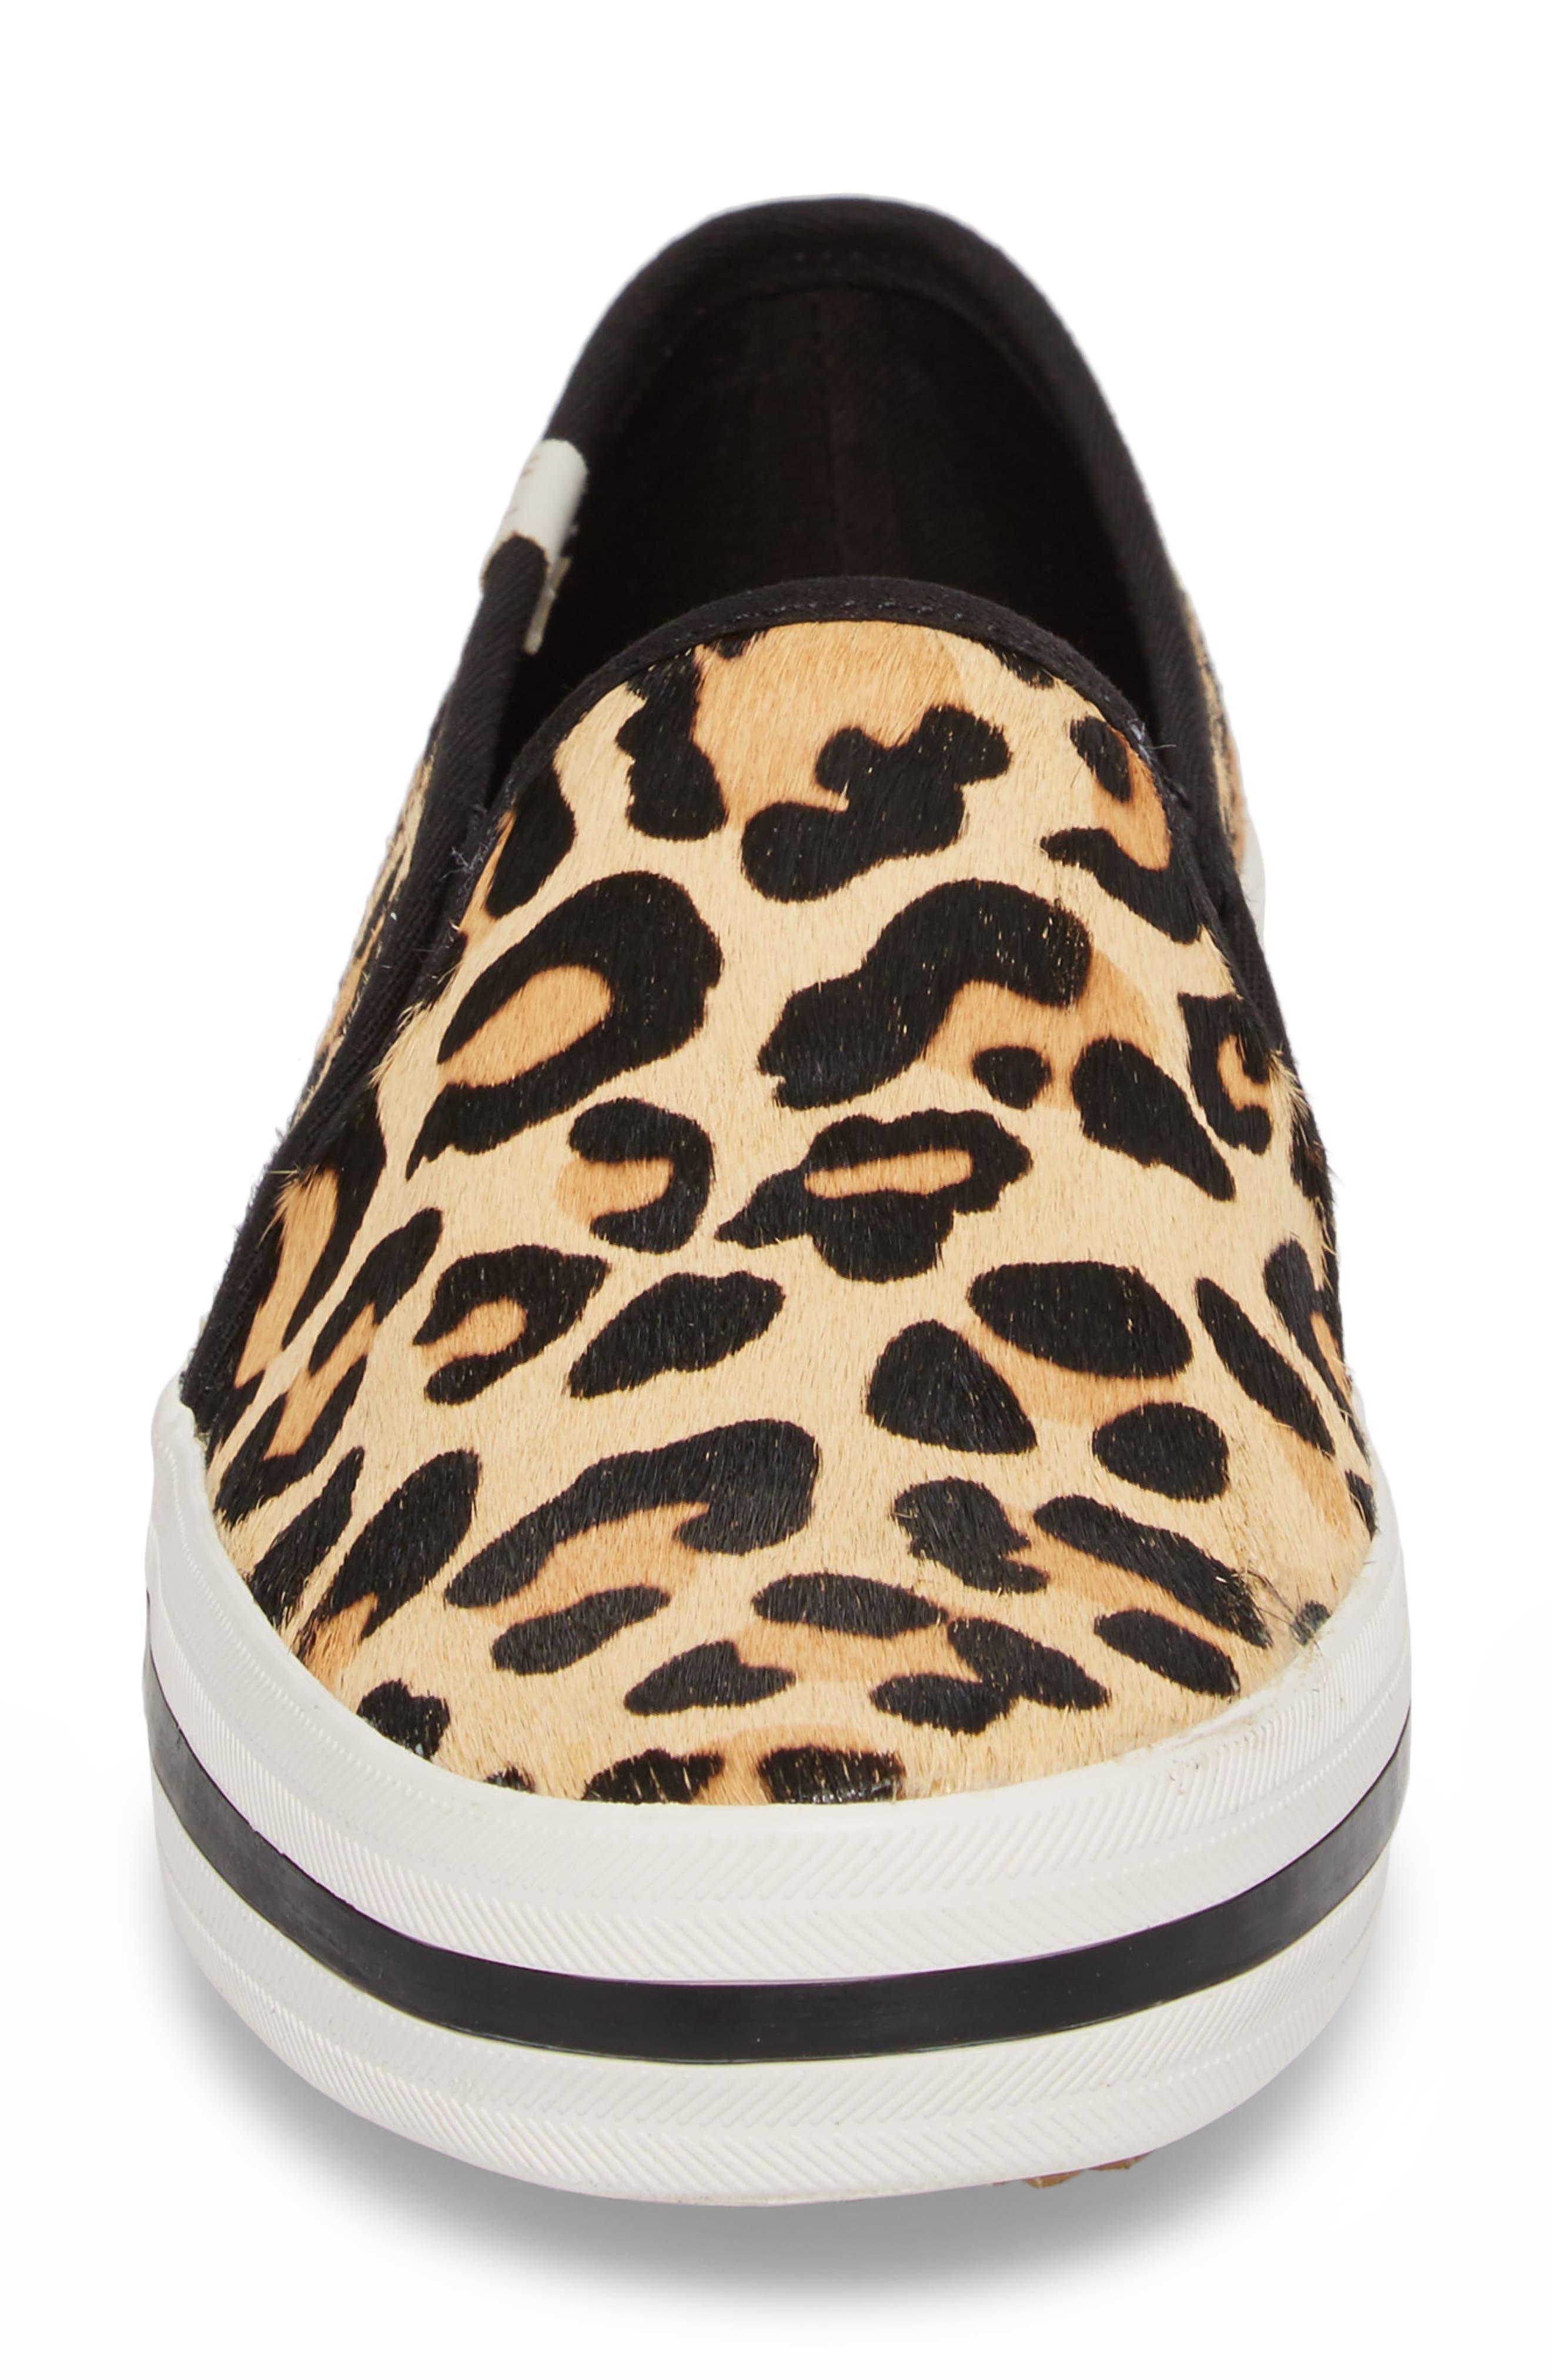 Keds<sup>®</sup> x kate spade Double Decker Slip-On Sneaker,                             Alternate thumbnail 4, color,                             Tan Pony Hair